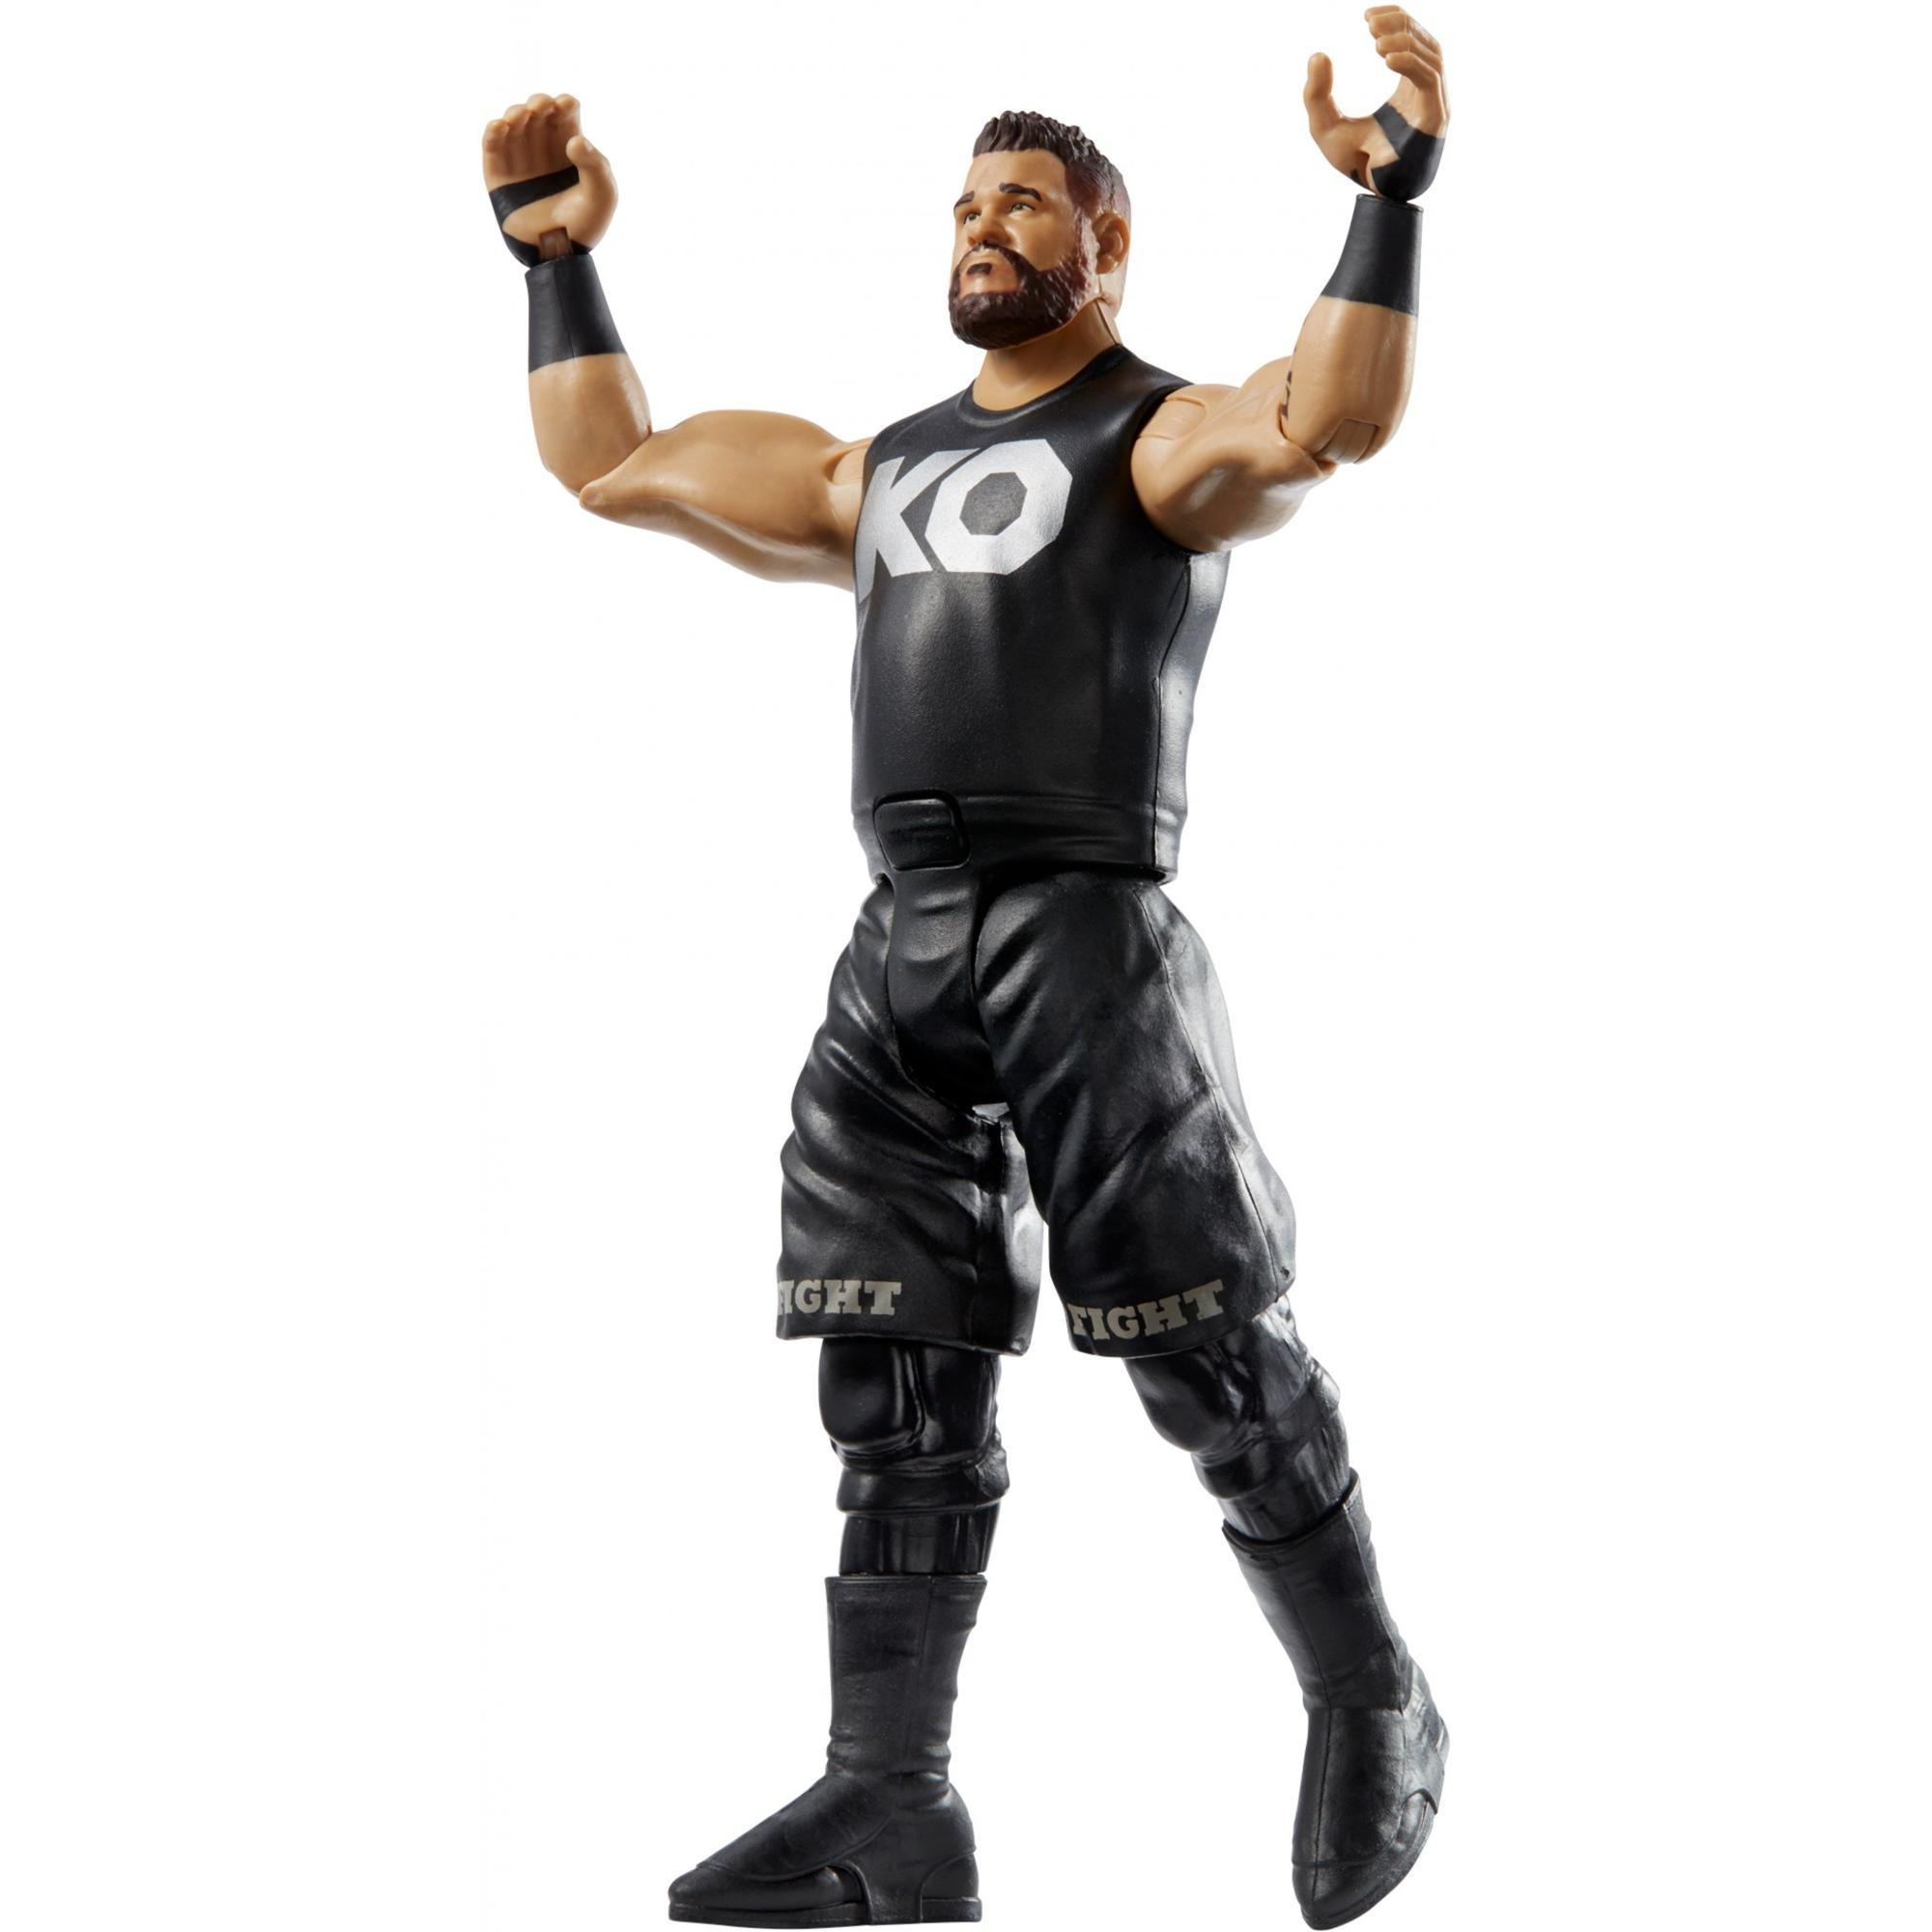 WWE Superstars Kevin Owens